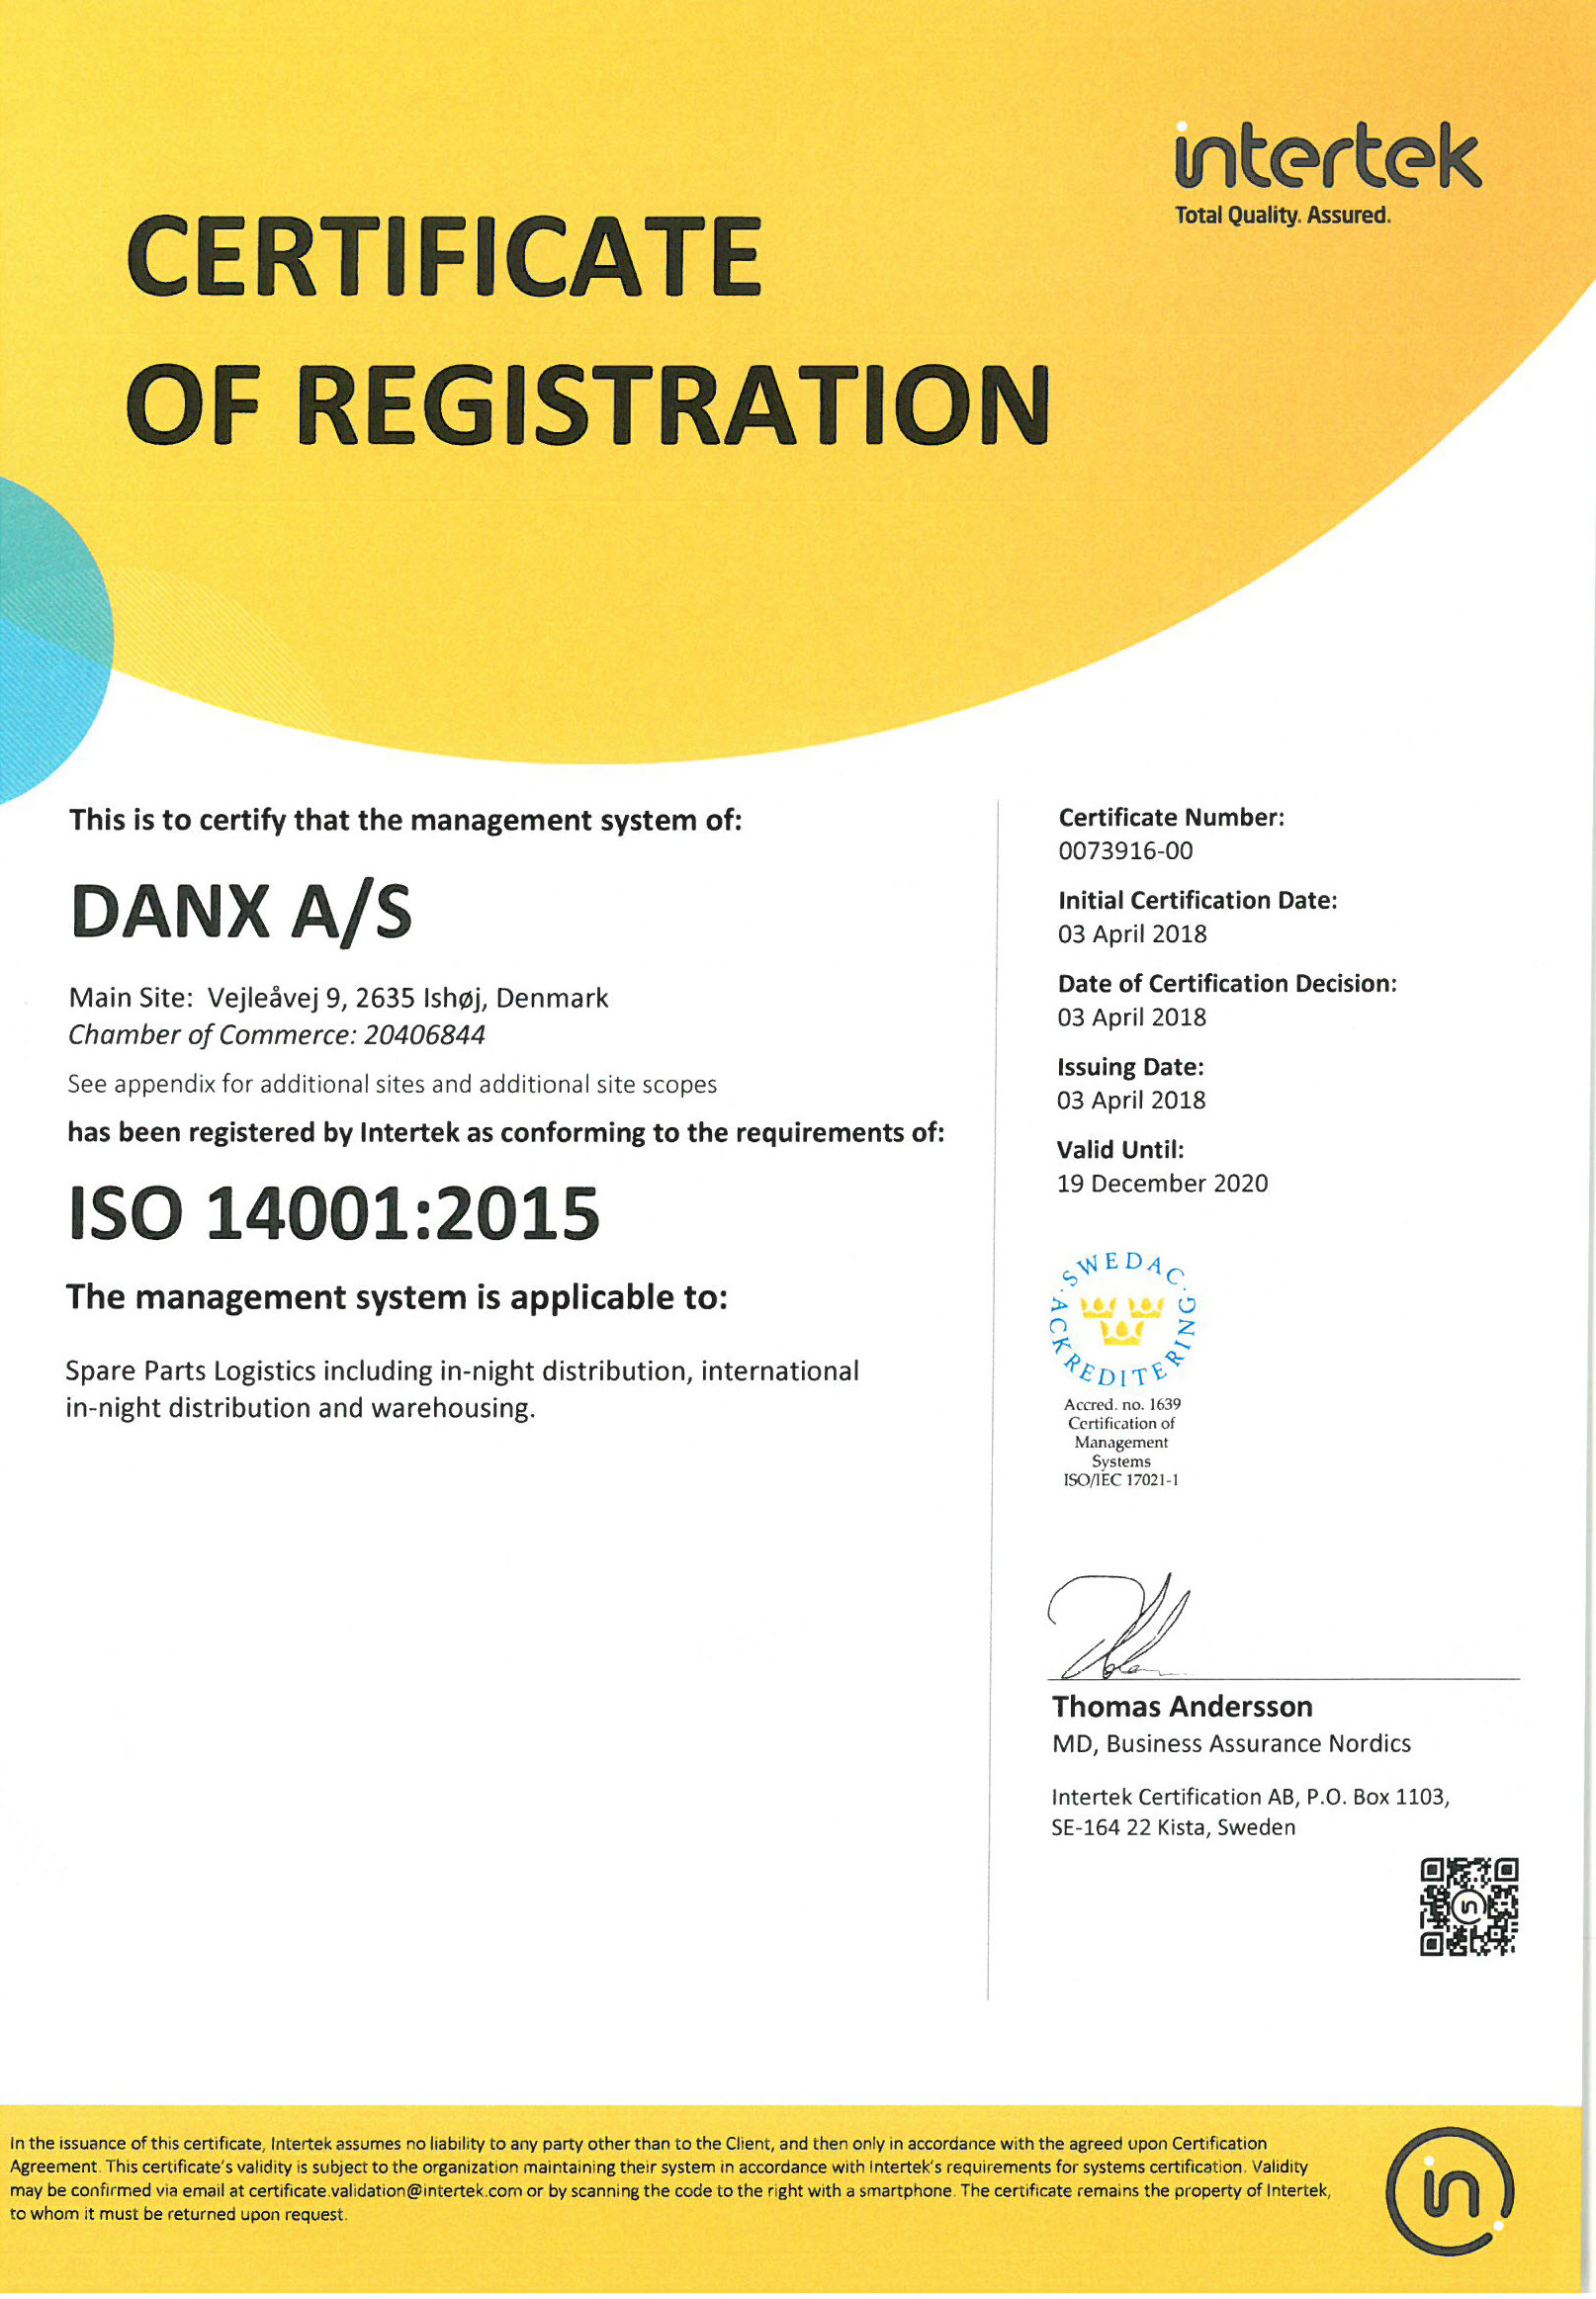 ISO14001,Danx A/s Denmark,Norway,Sweden,Finland